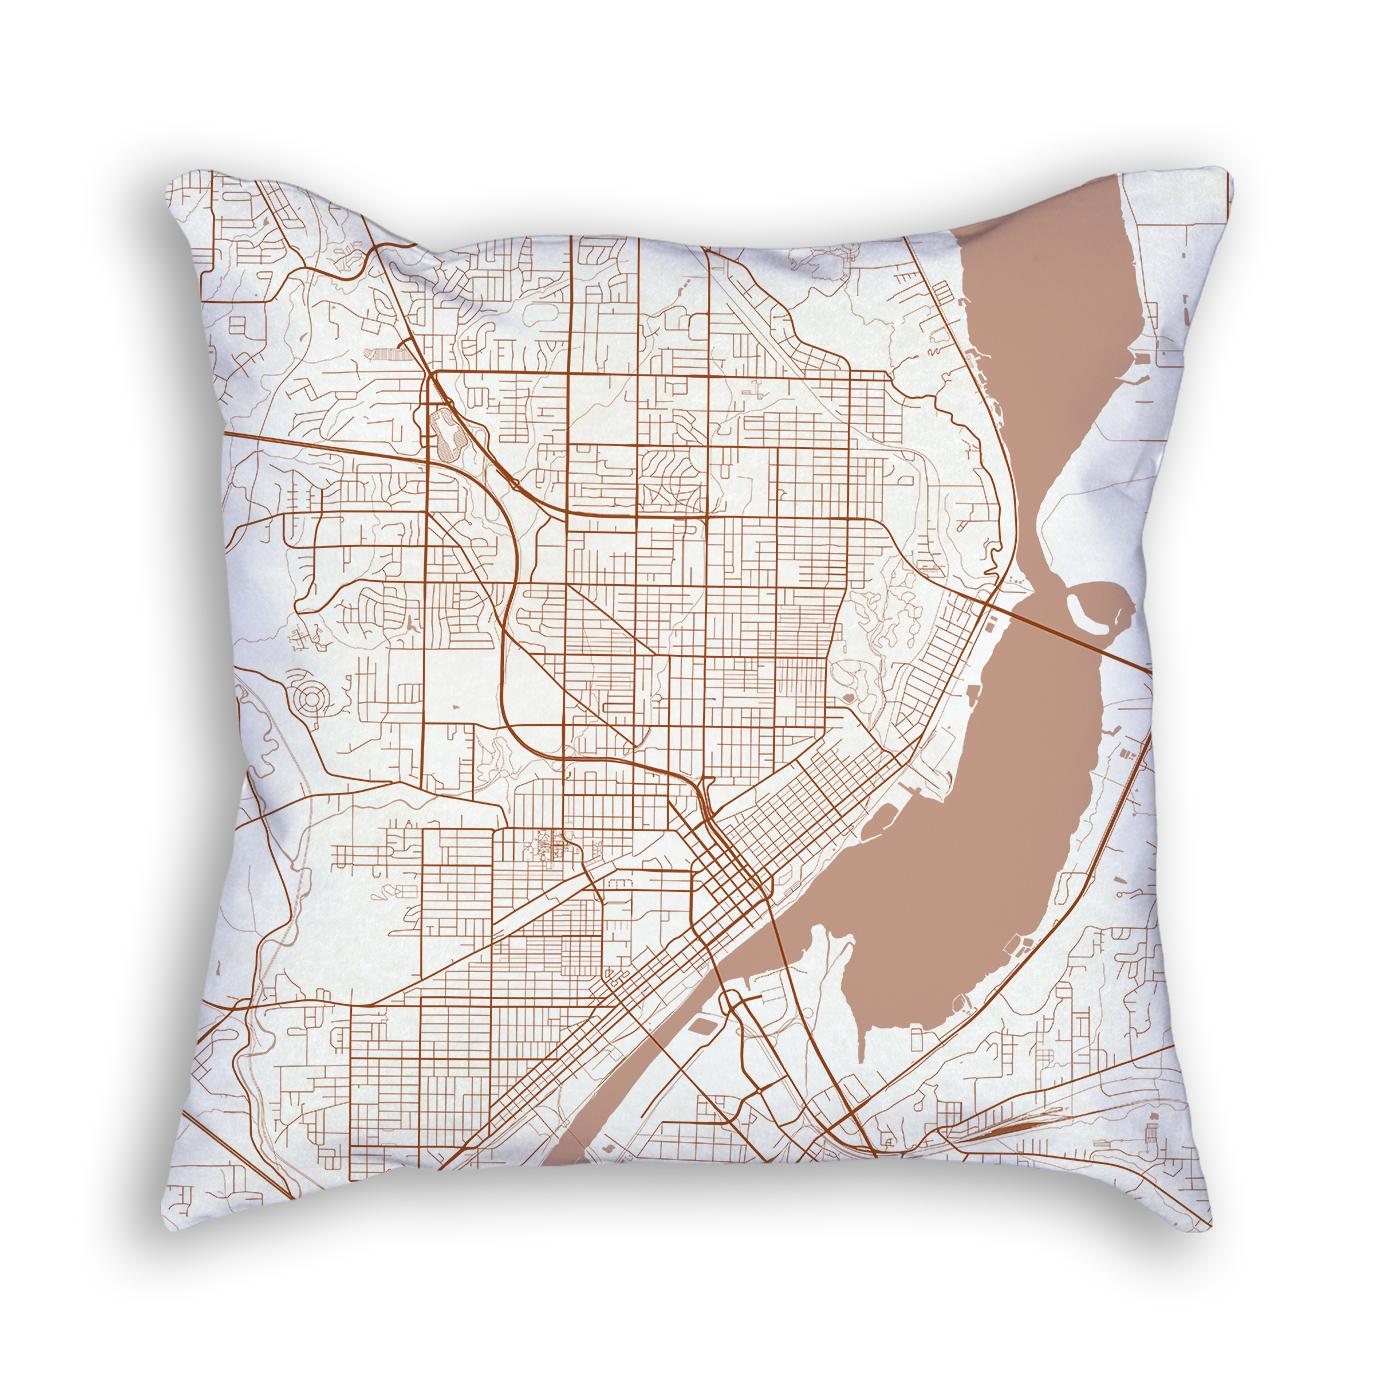 Peoria Illinois City Map Art Decorative Throw Pillow